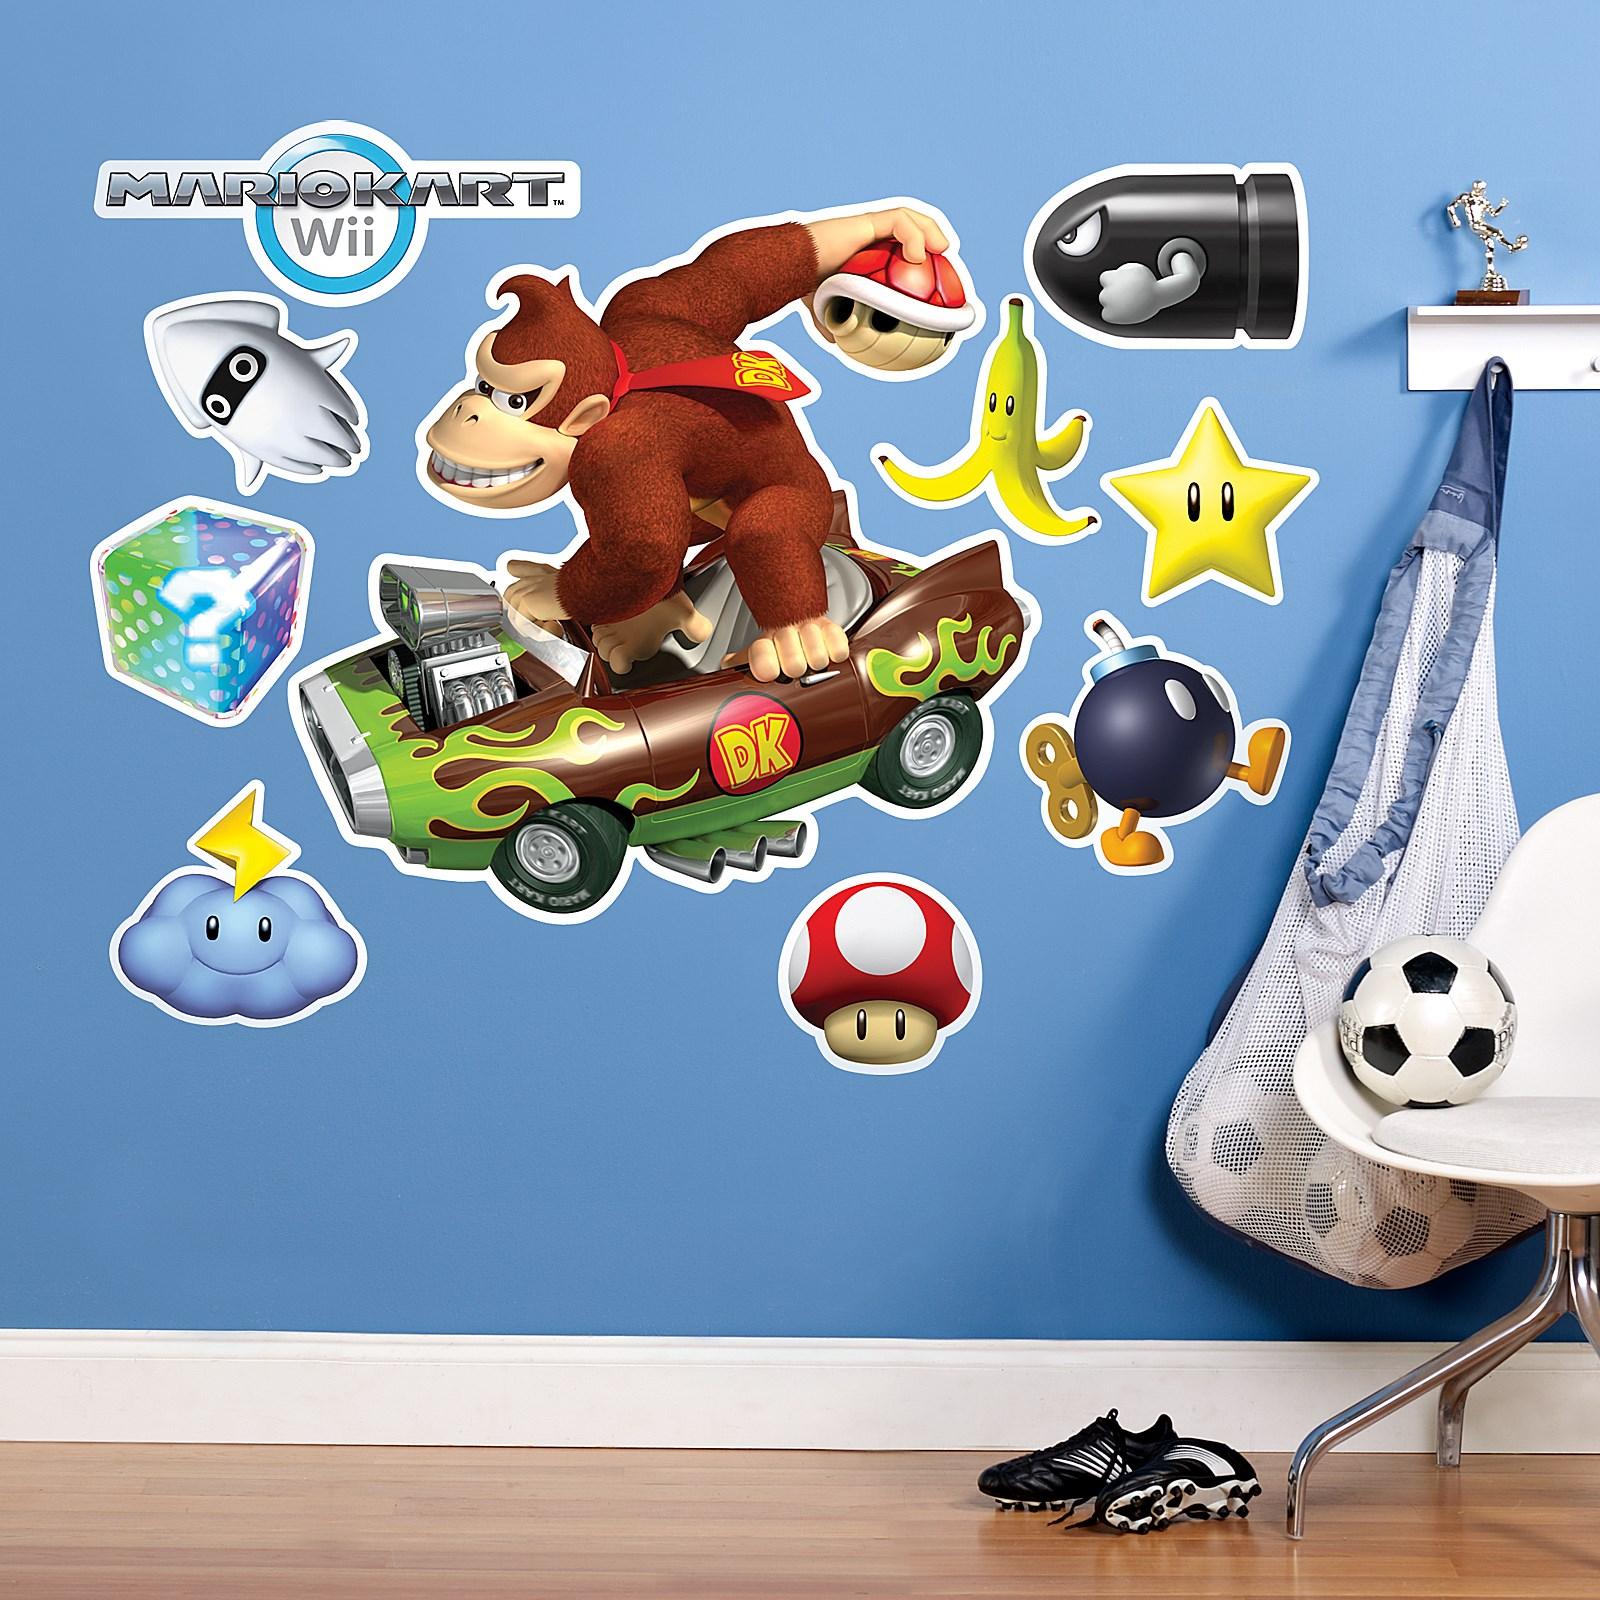 Mario Kart Wii Donkey Kong Giant Wall Decal